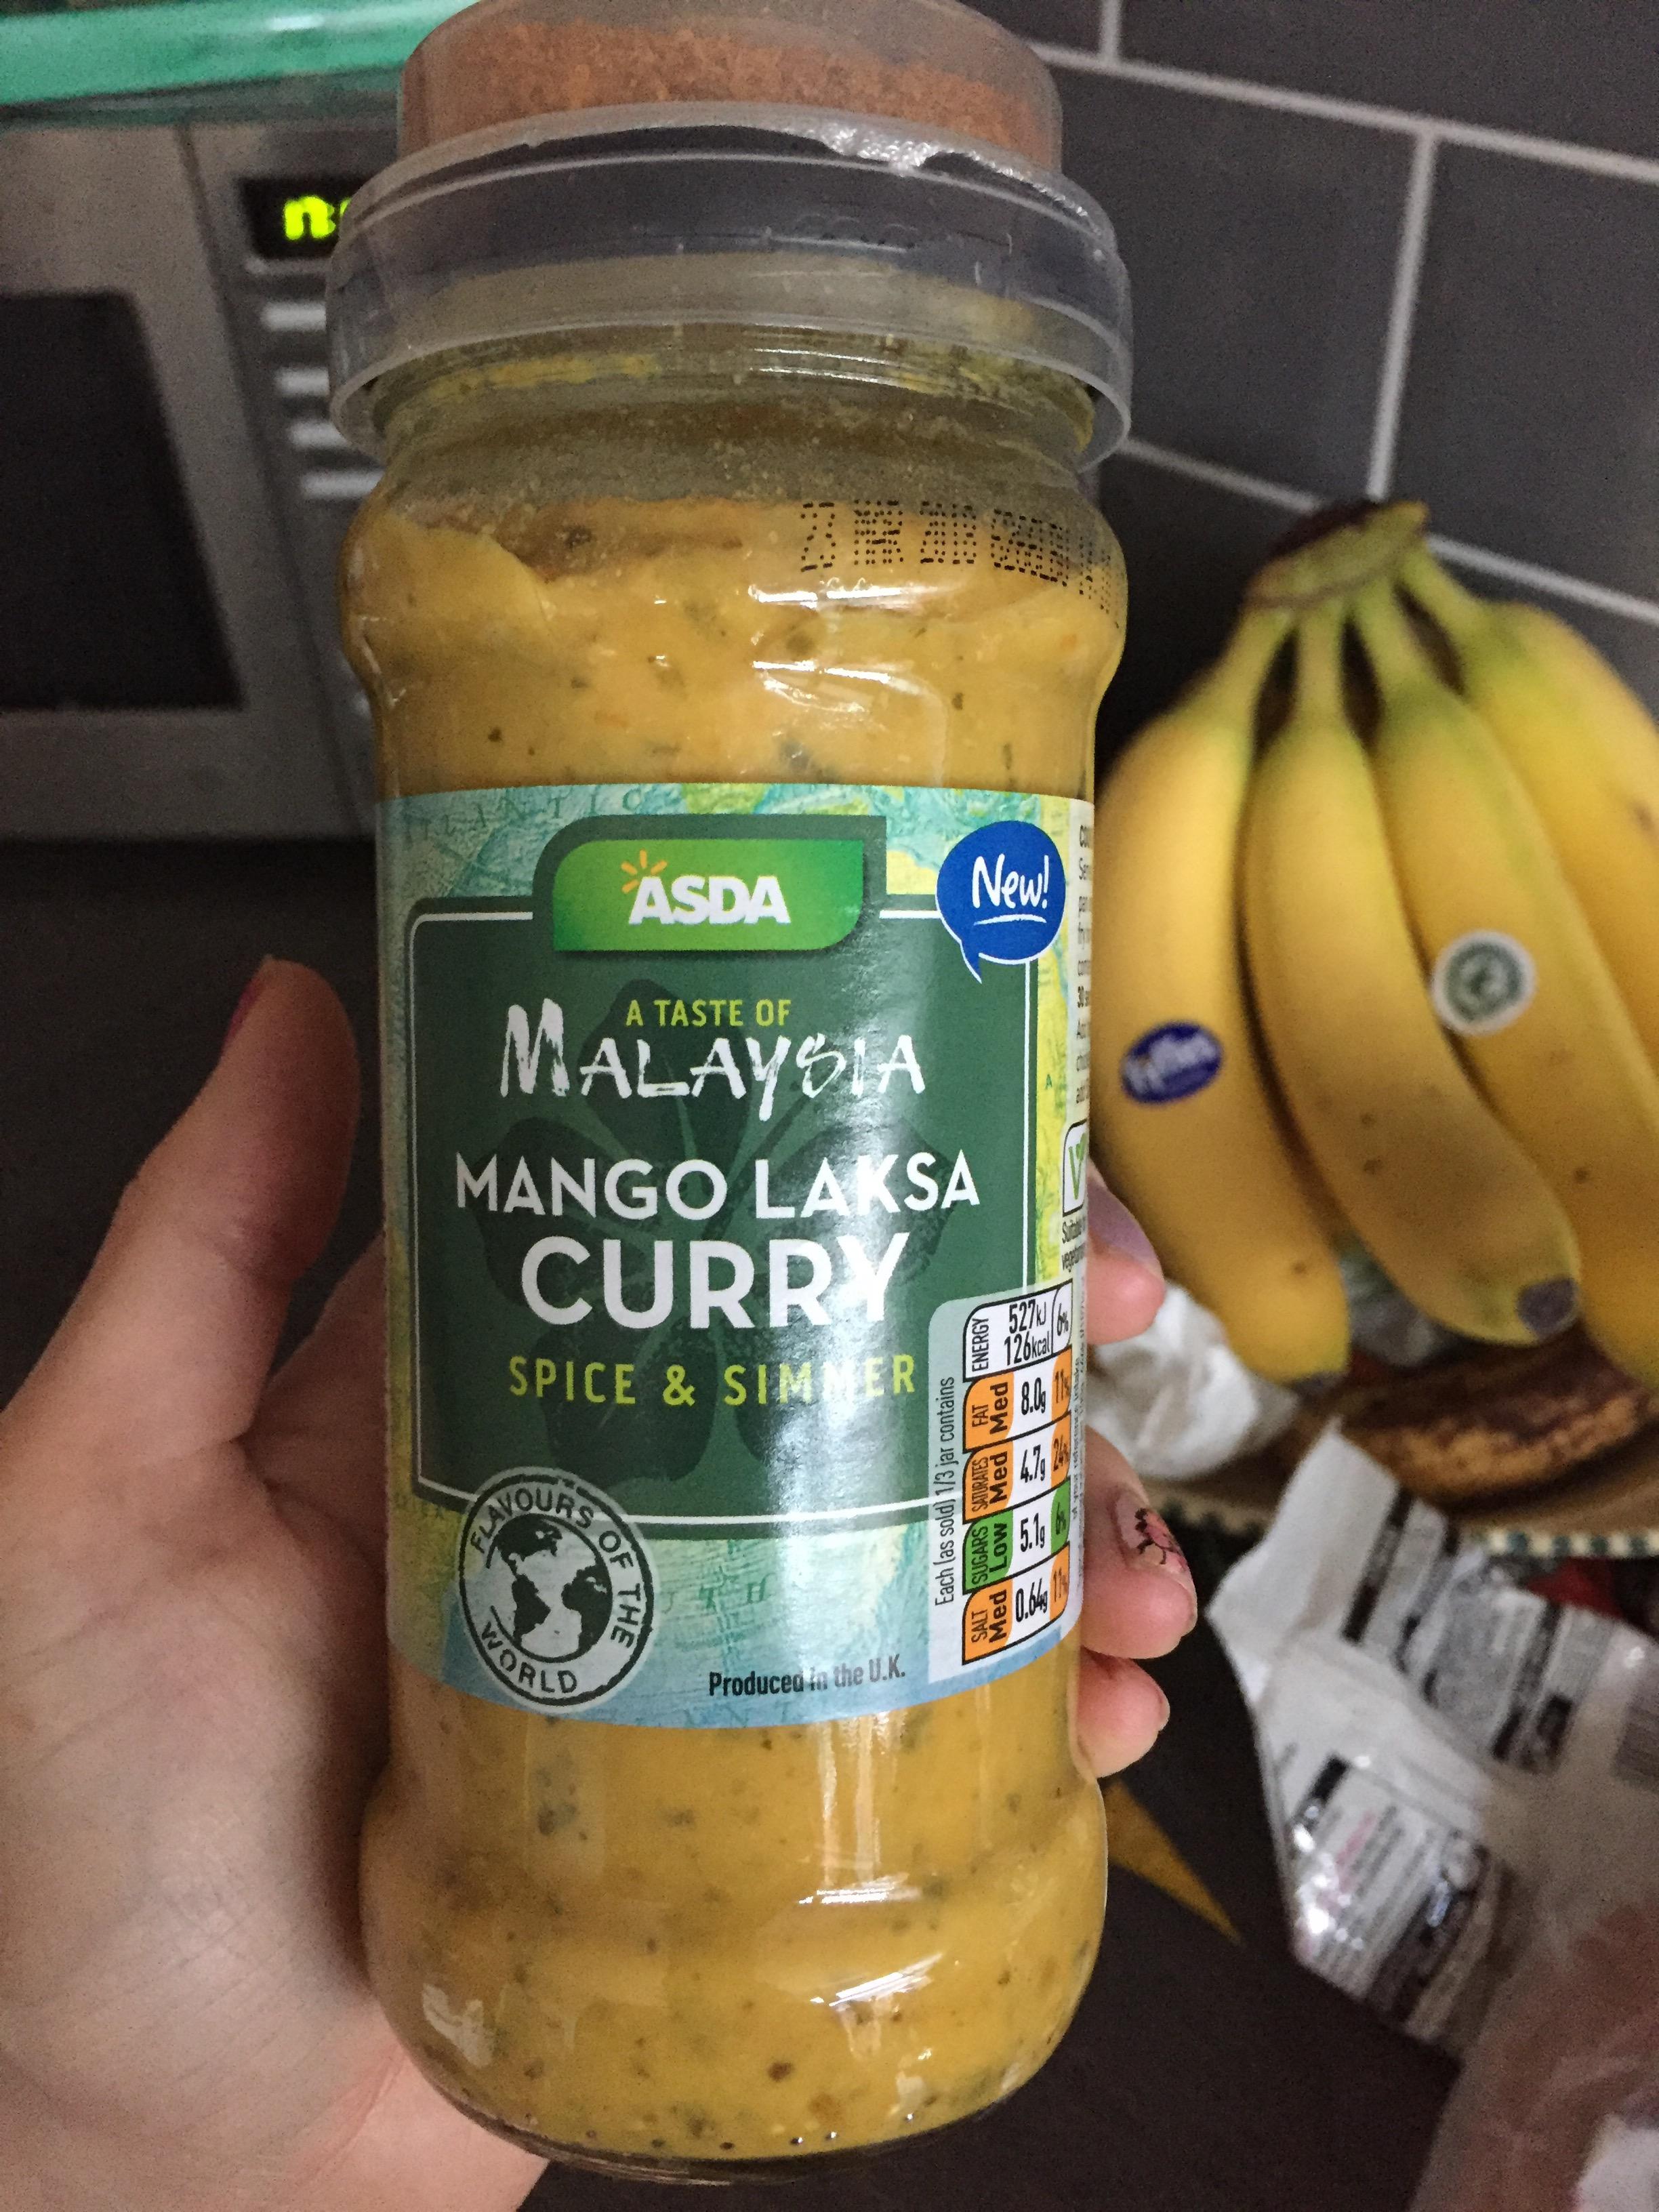 New Asda Mango Laksa Curry Sauce And Homemade Ovenbaked Naan